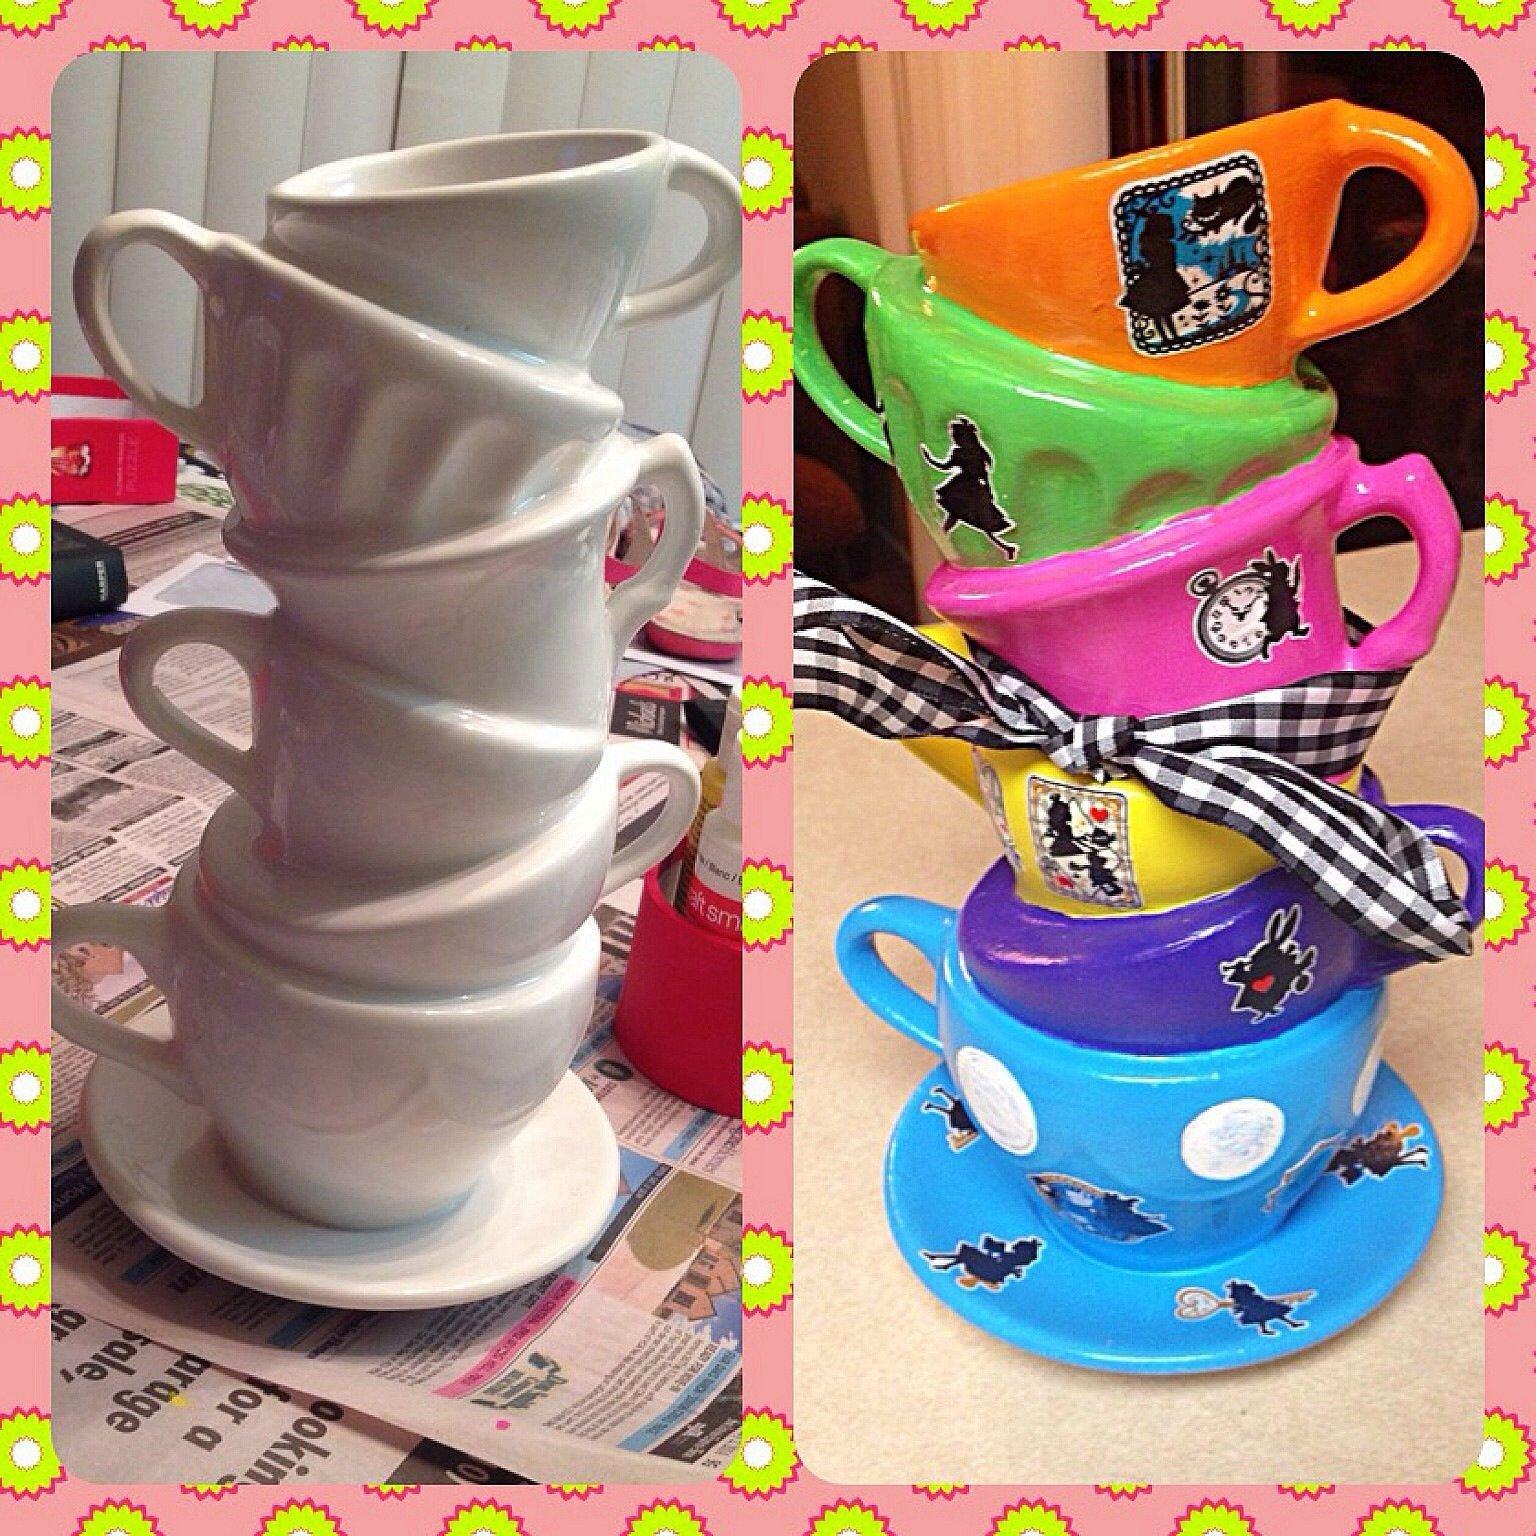 10 Lovable Alice In Wonderland Centerpiece Ideas diy alice in wonderland centerpiece my crafts pinterest alice 2020